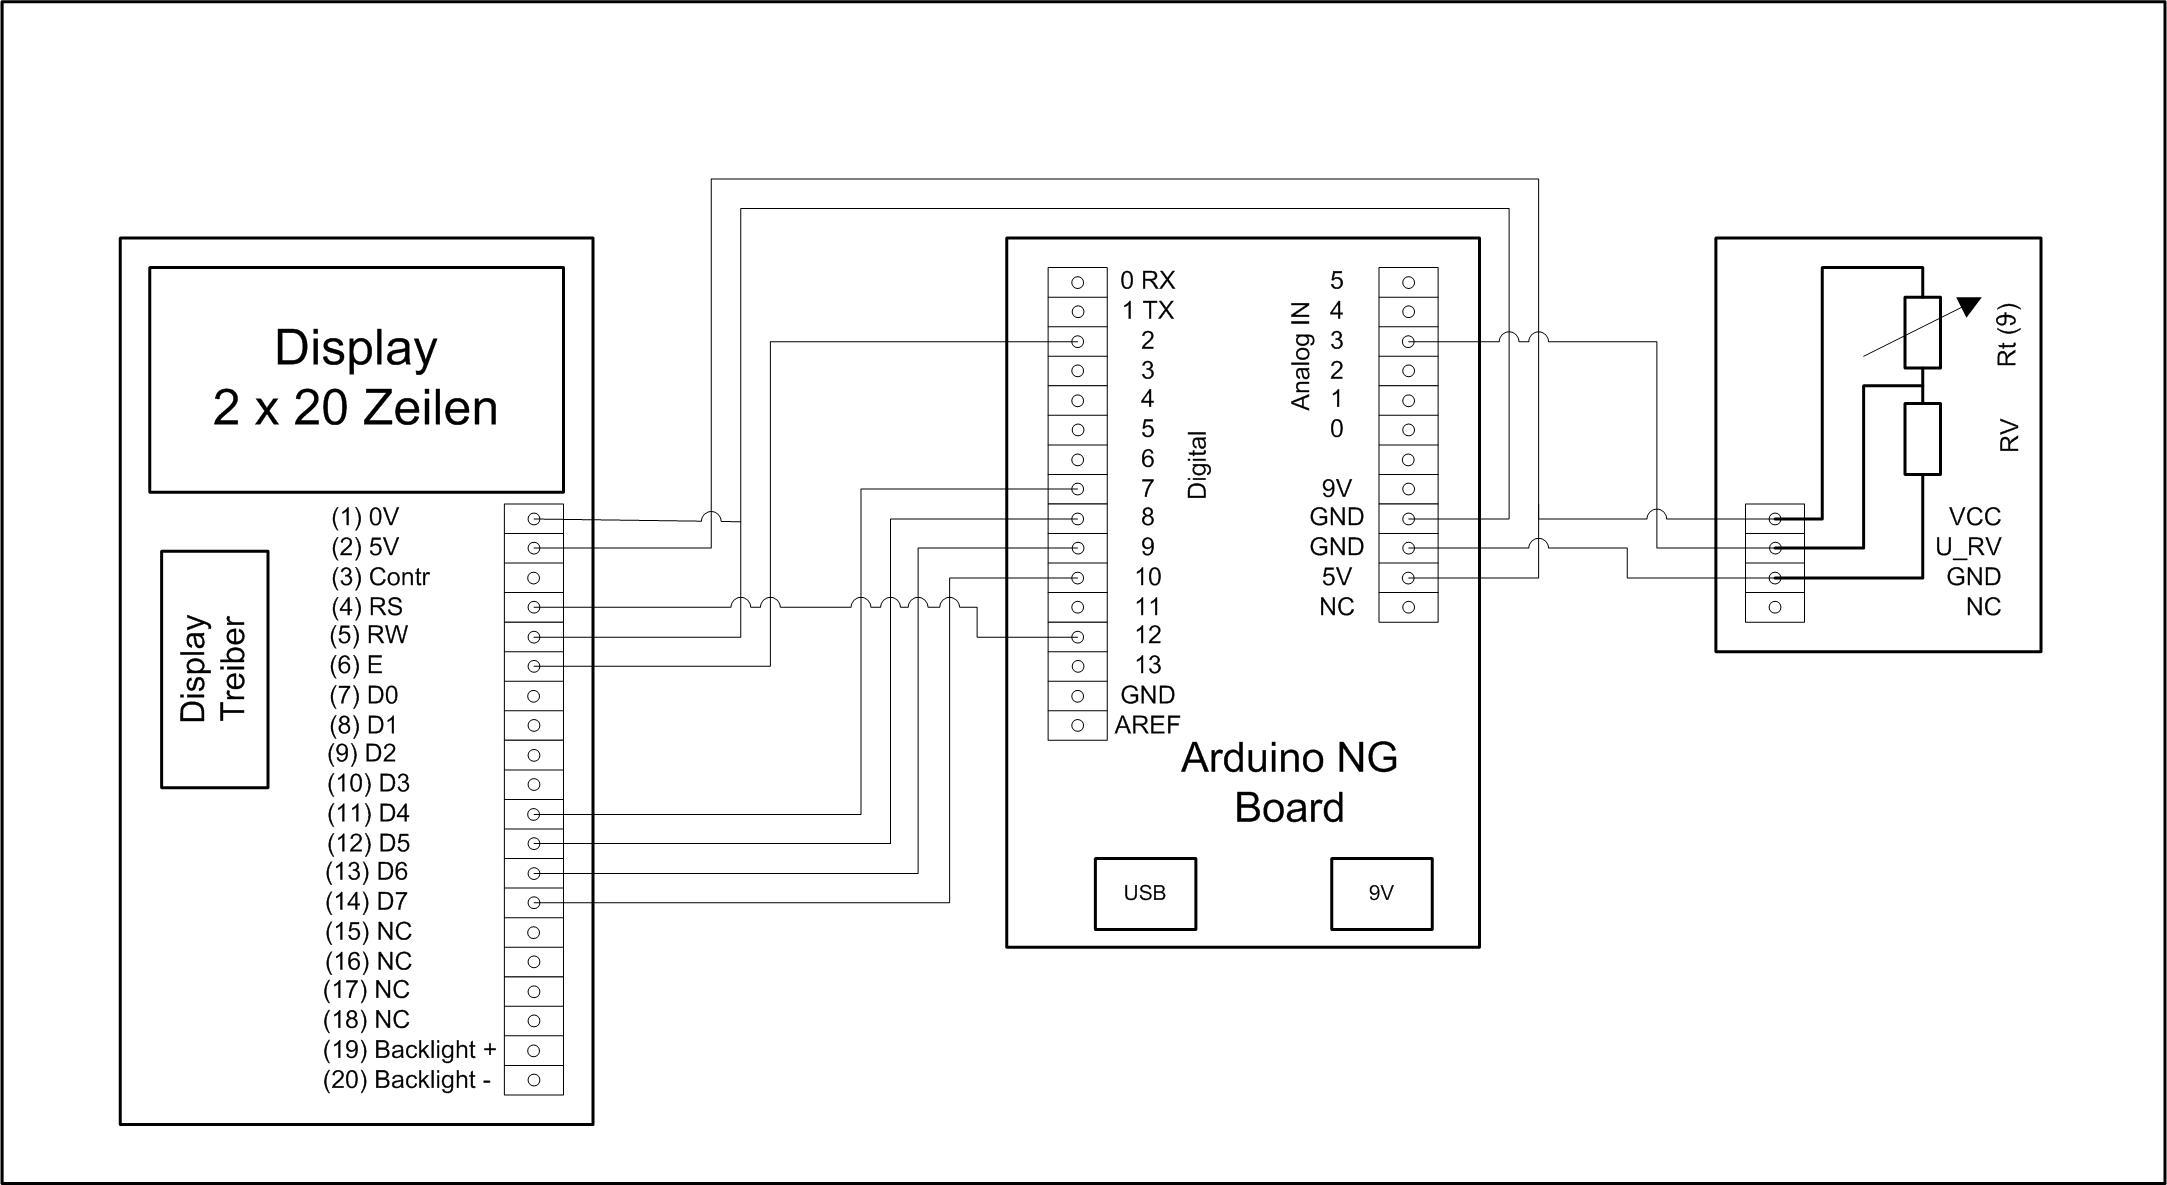 systematischer fehler bei analog digitalwandlung atmega8. Black Bedroom Furniture Sets. Home Design Ideas